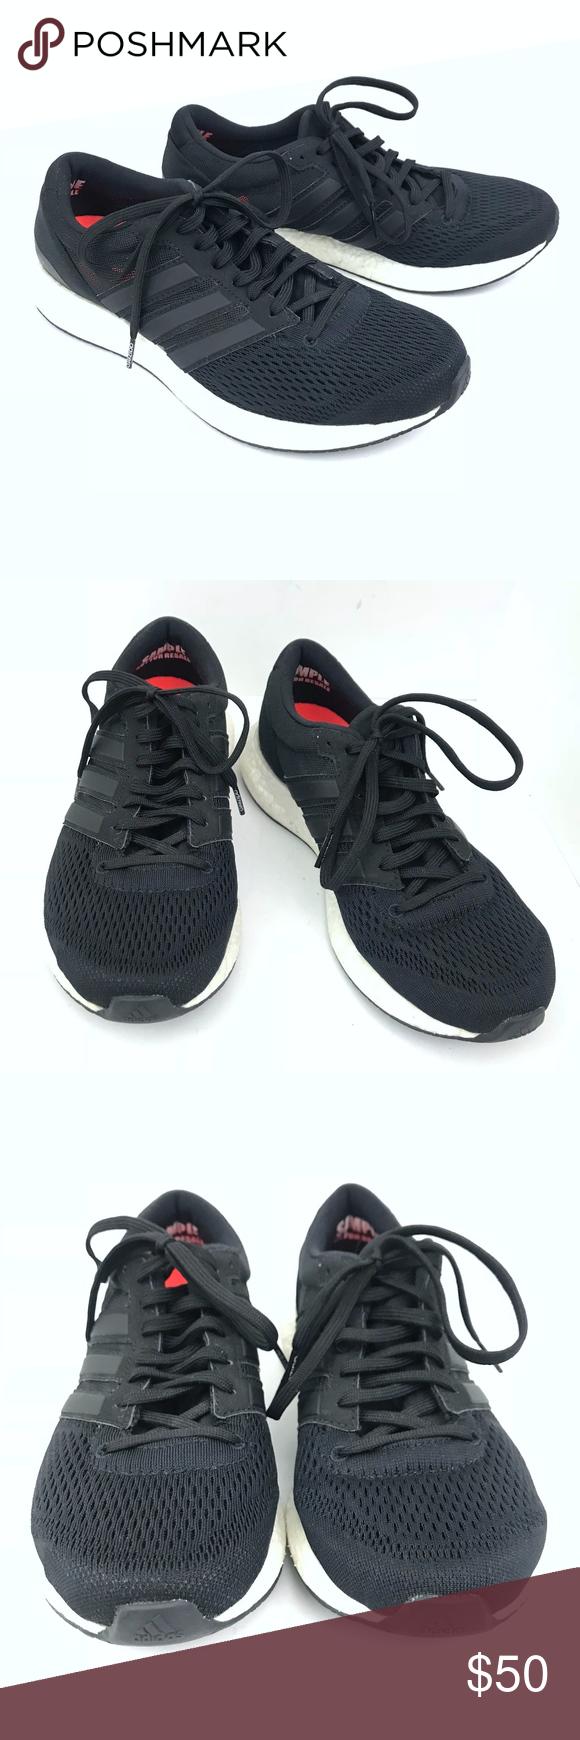 Adidas Adizero Boston Boost 6 Black Womens Sz 7 Adidas